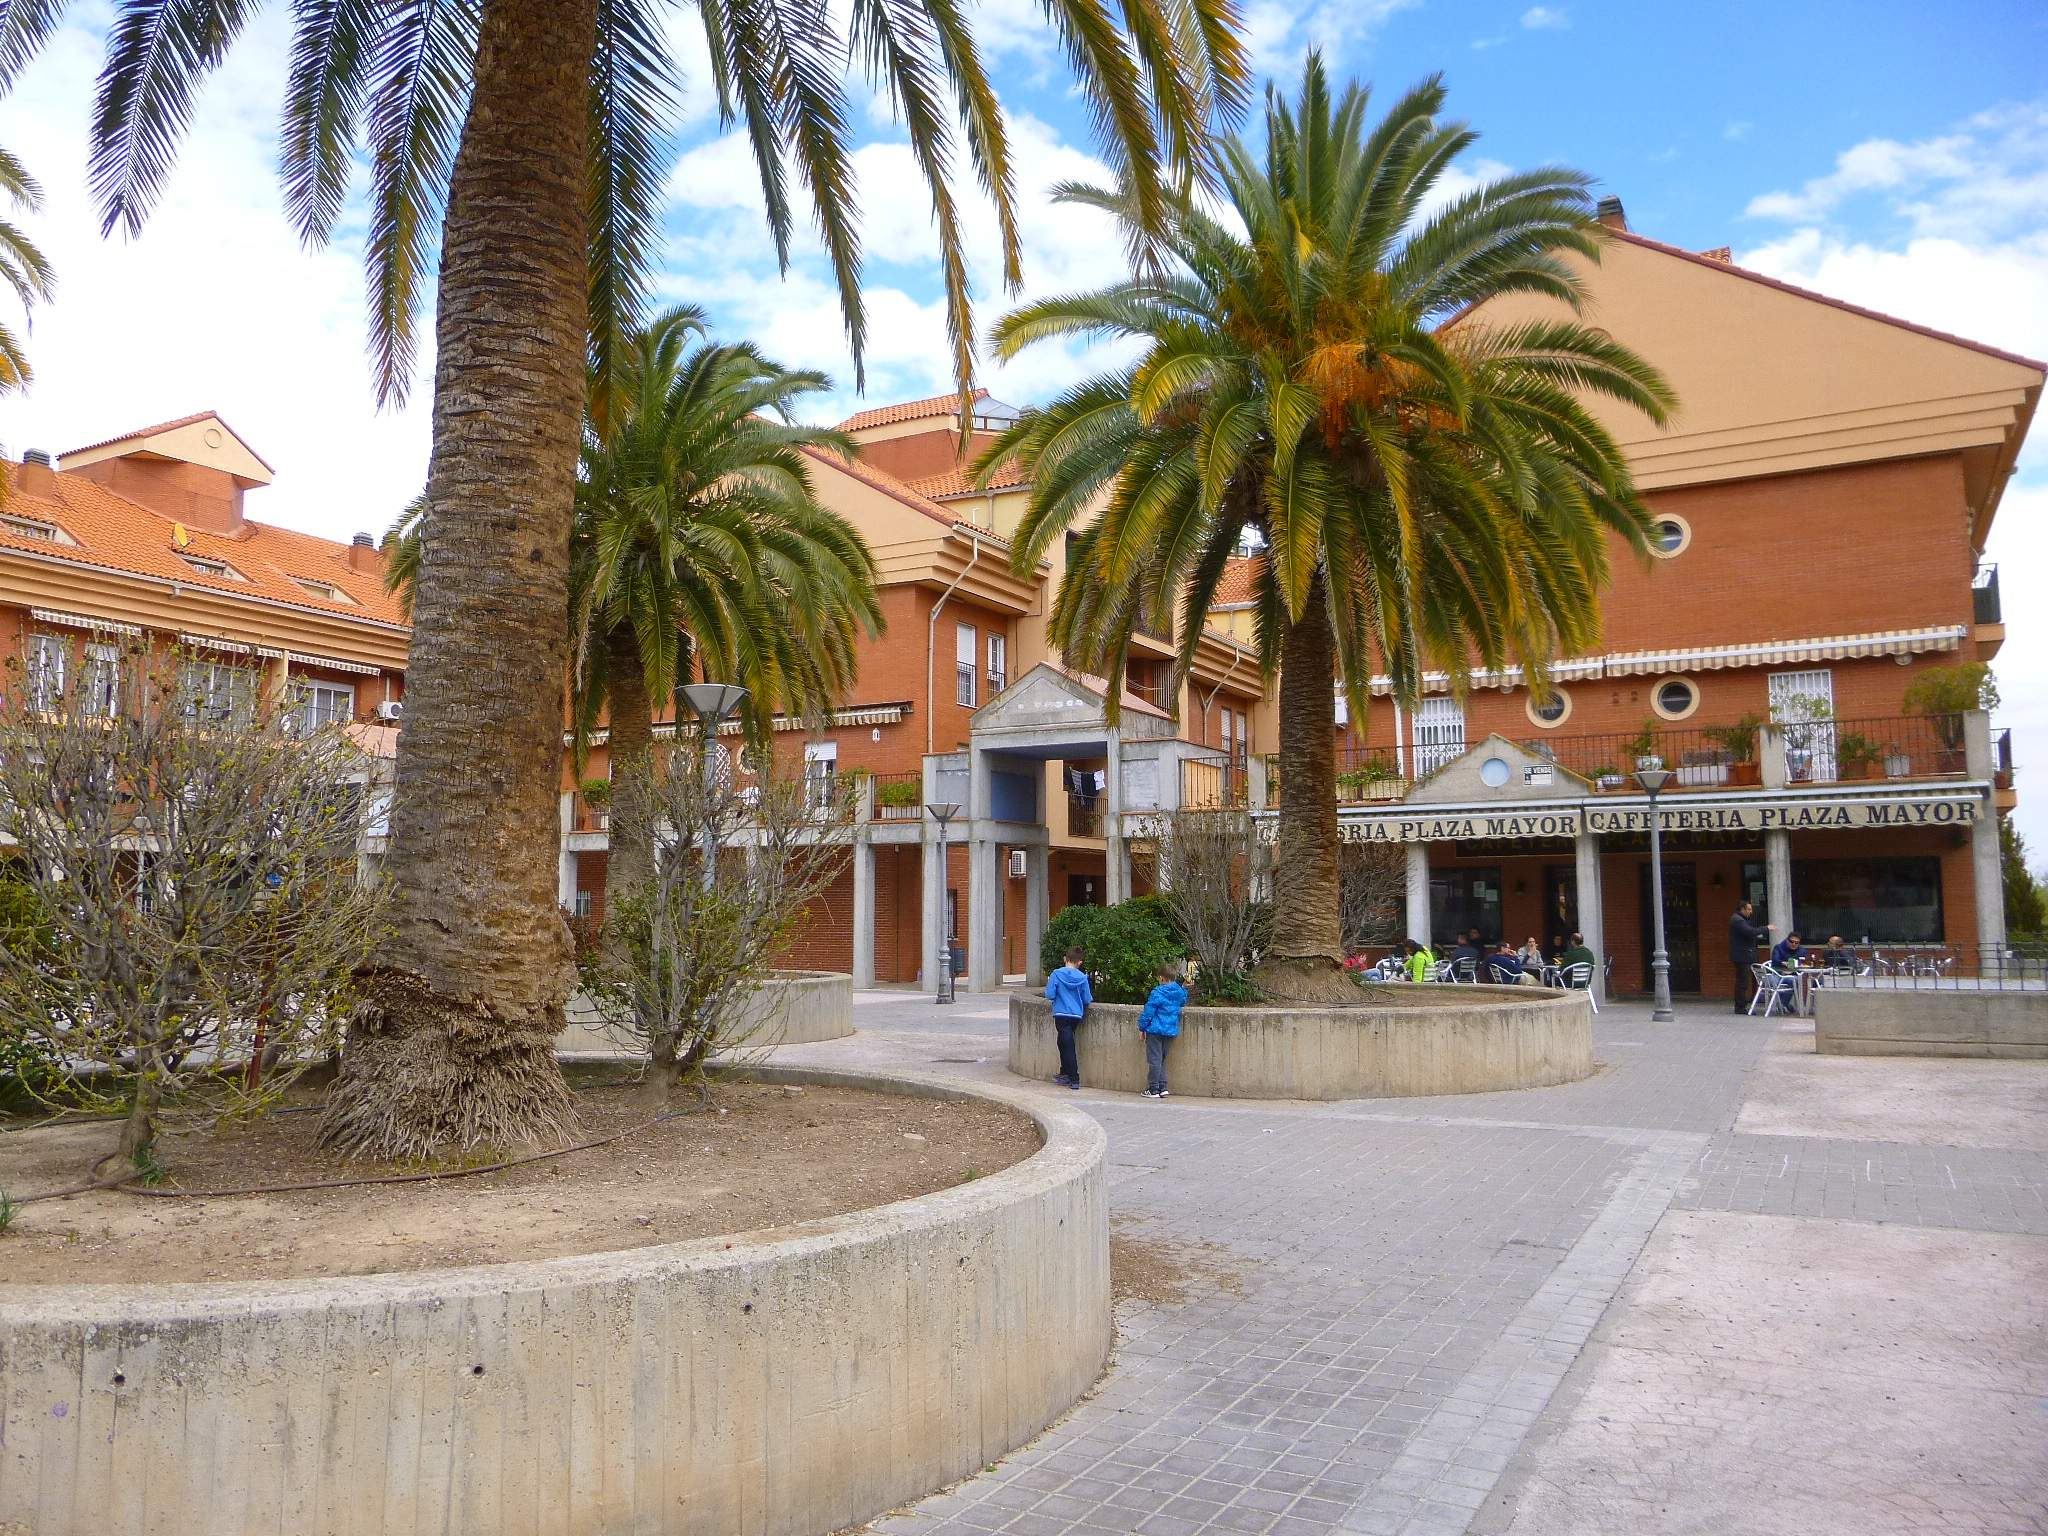 Ciempozuelos_-_Plaza_Mayor.JPG